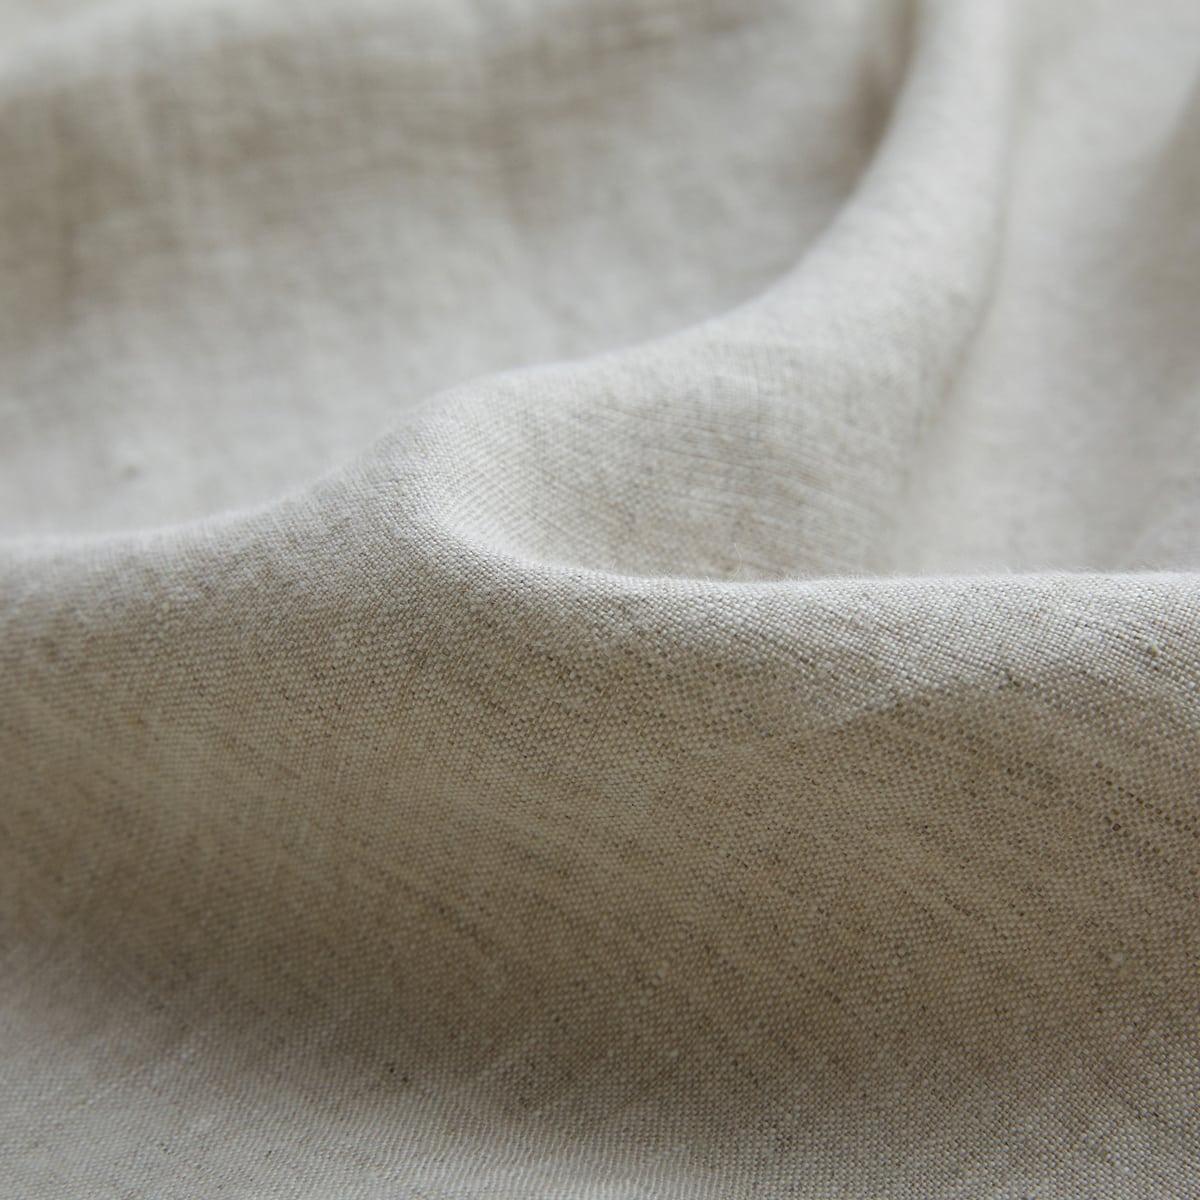 Home - Luxury Bed Linen OEM Manufacturer 3